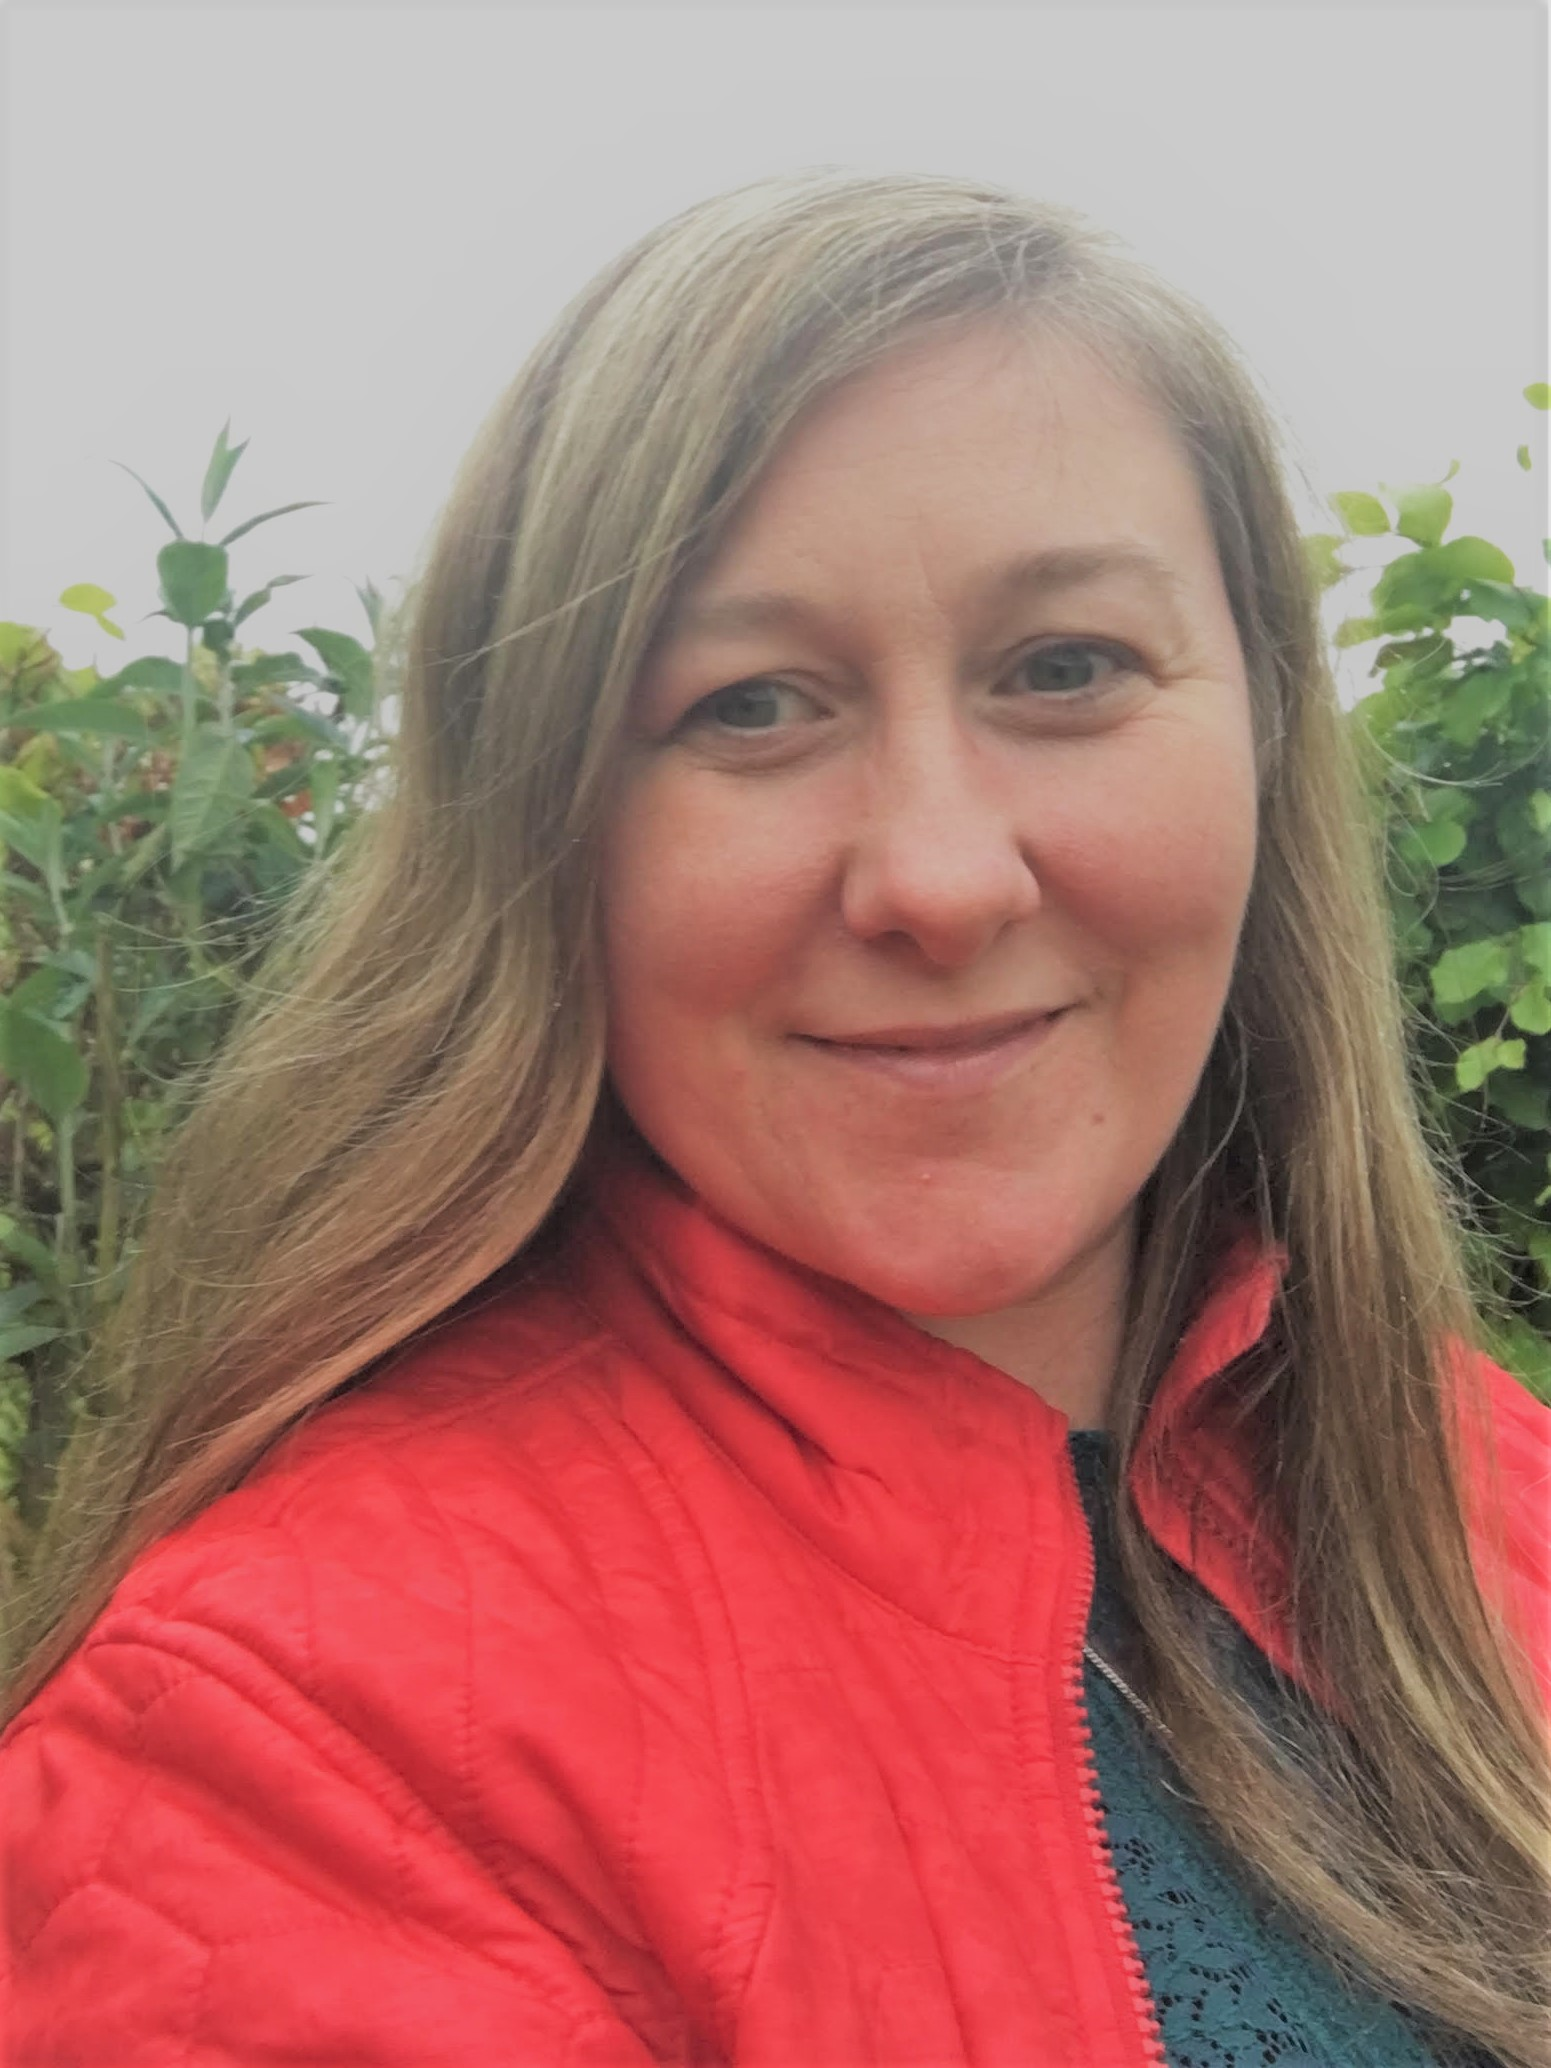 Vicki Hornby